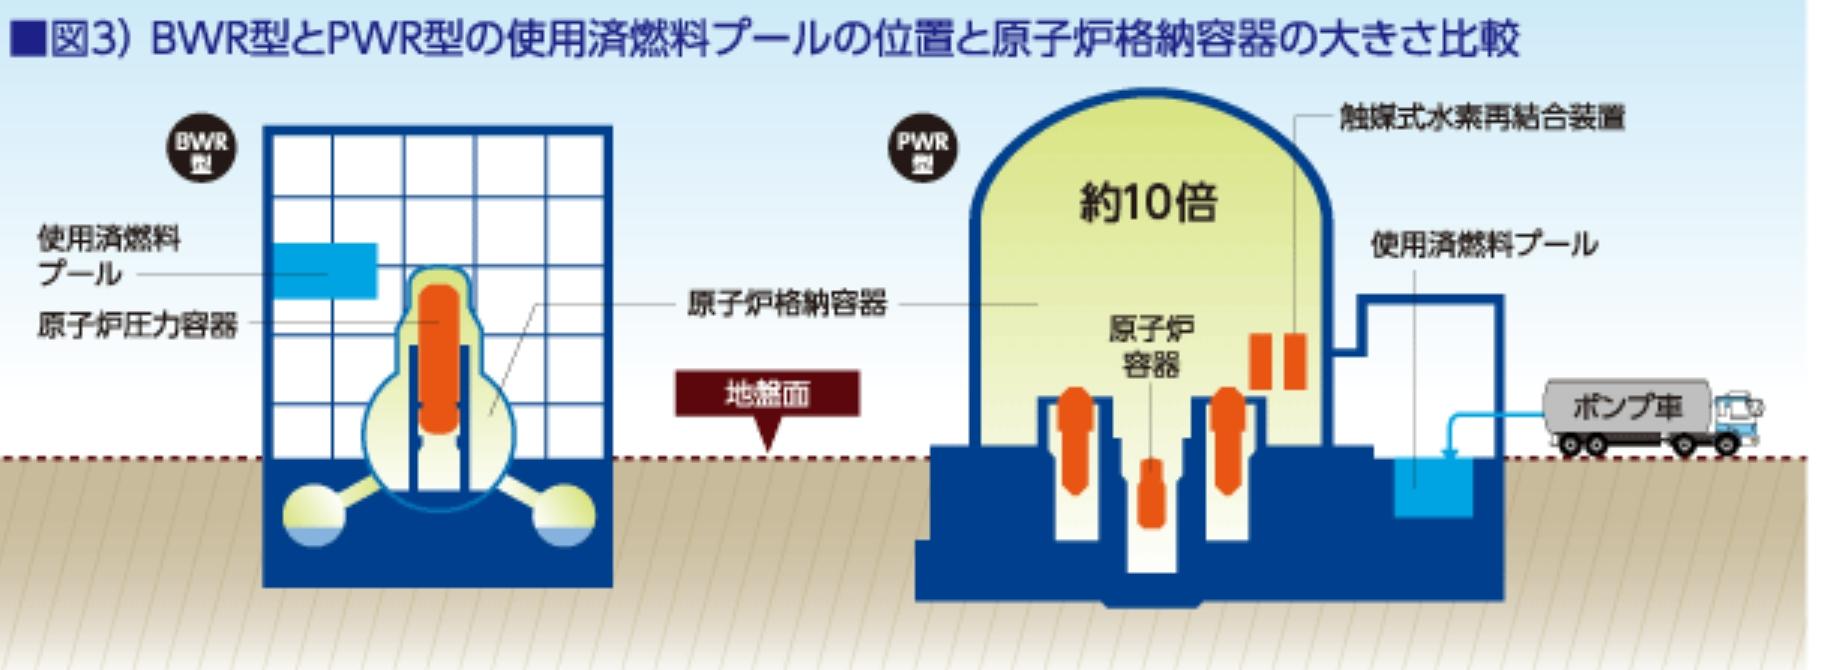 BWR型とPWR型原子炉格納容器